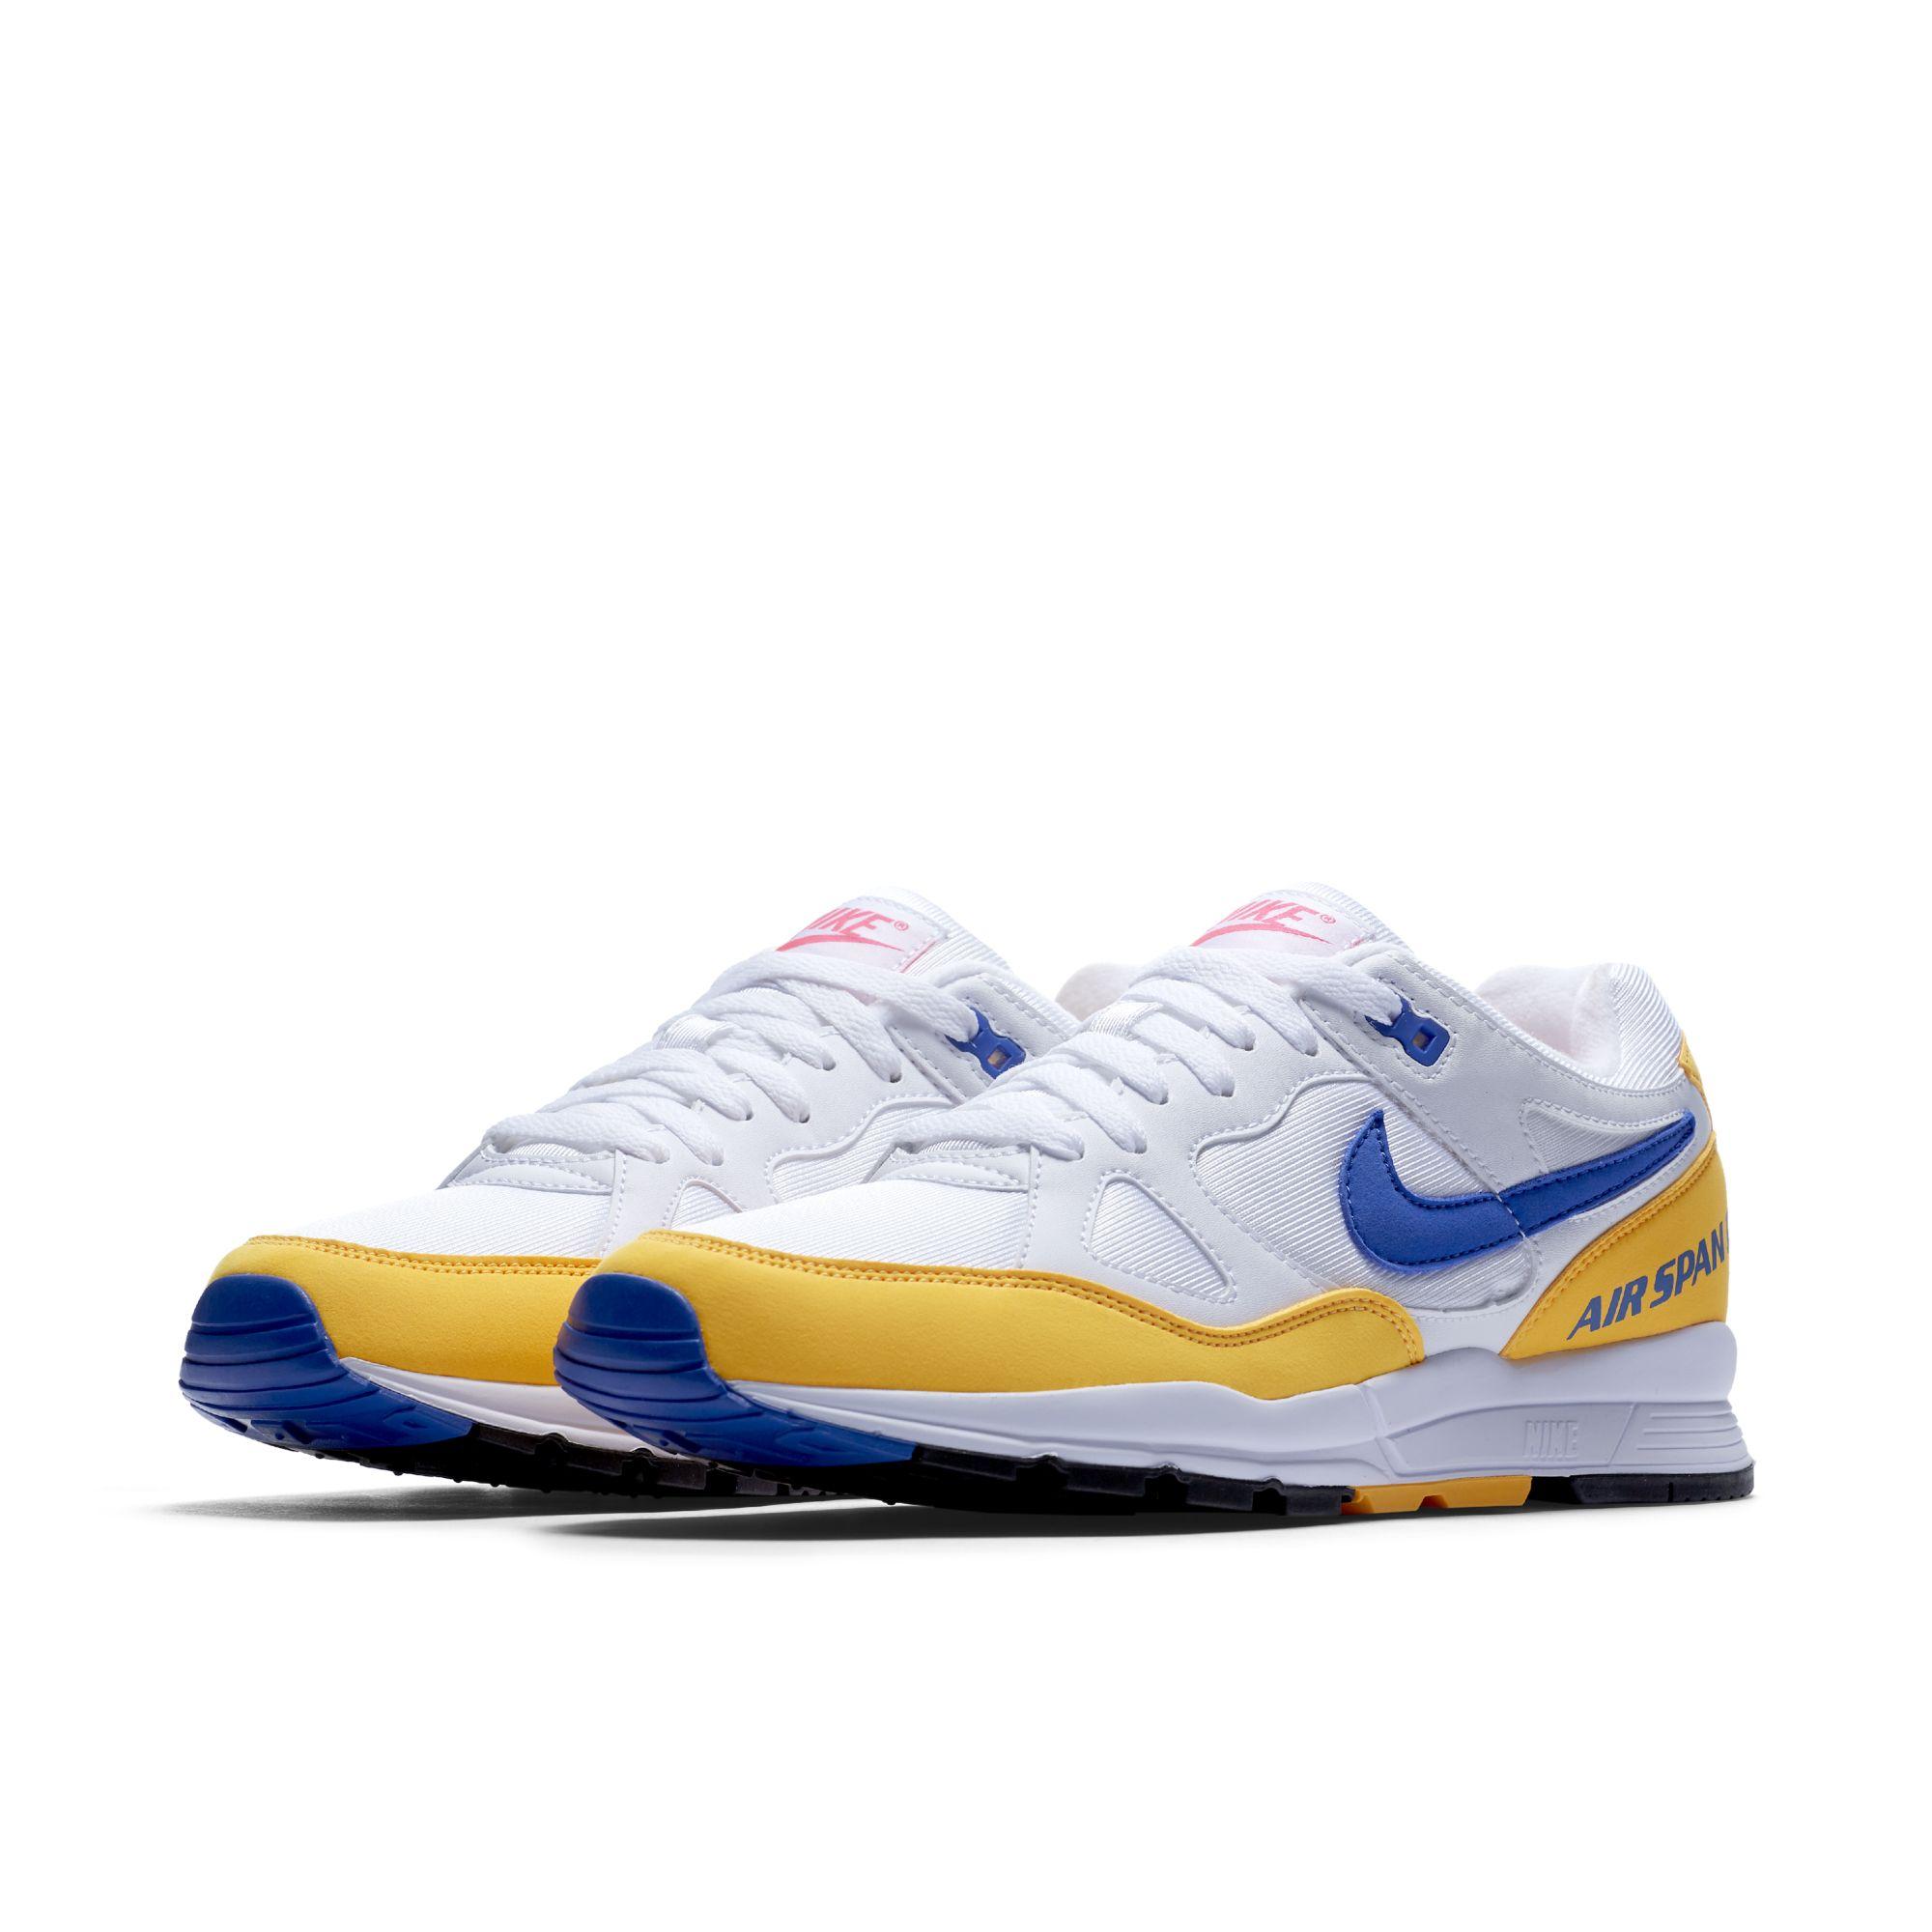 span itempropnameNike Air Max 97 Retro Running Shoes Navy Bluespan